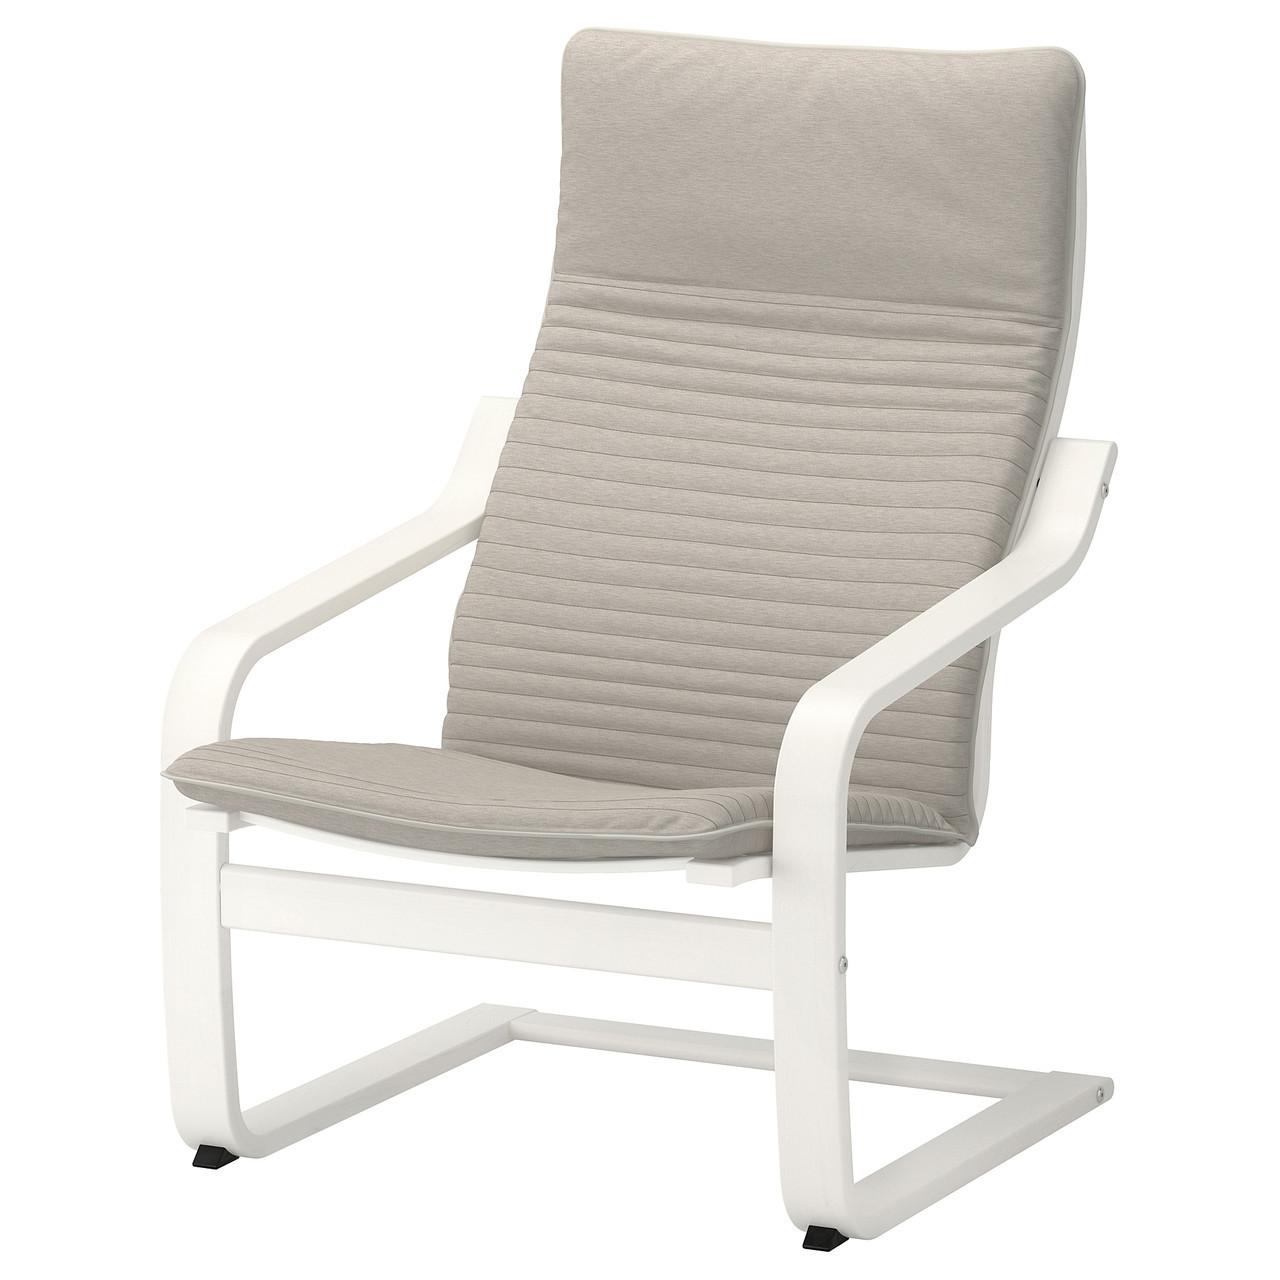 IKEA POANG Кресло, белое, Книса светло-бежевый  (392.408.05)